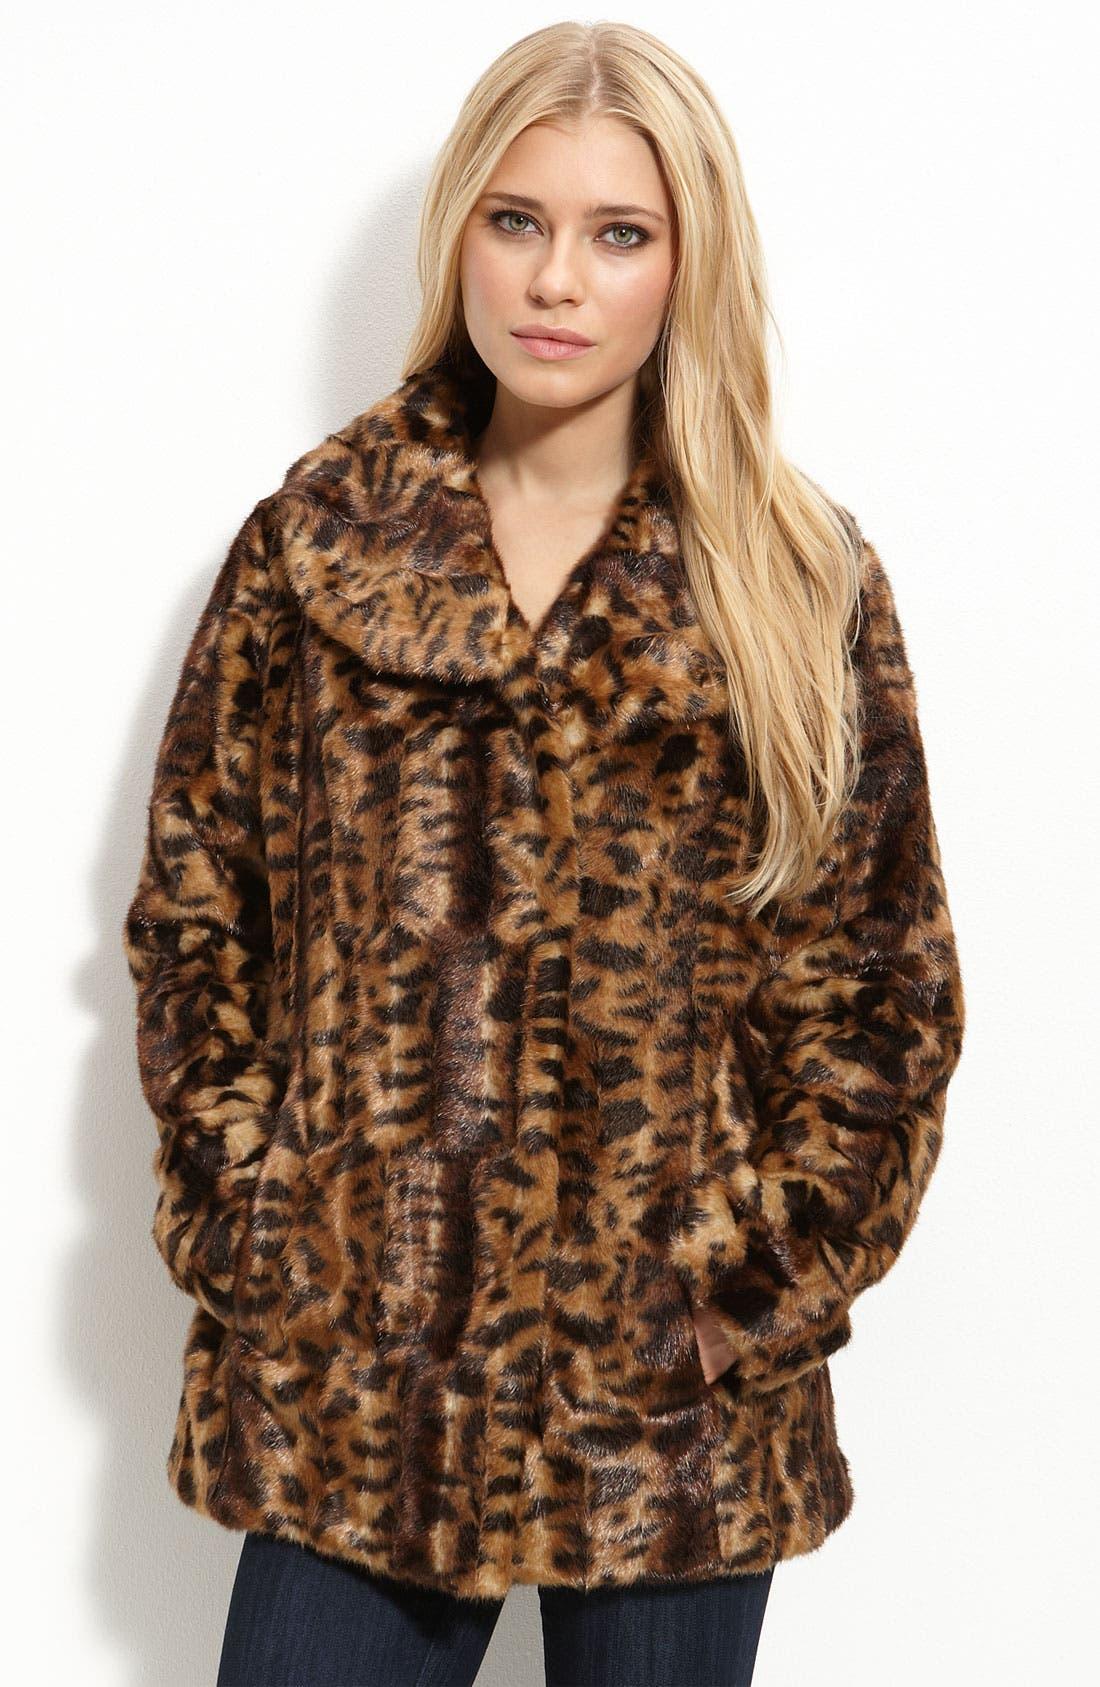 Alternate Image 1 Selected - Calvin Klein Faux Fur Jacket